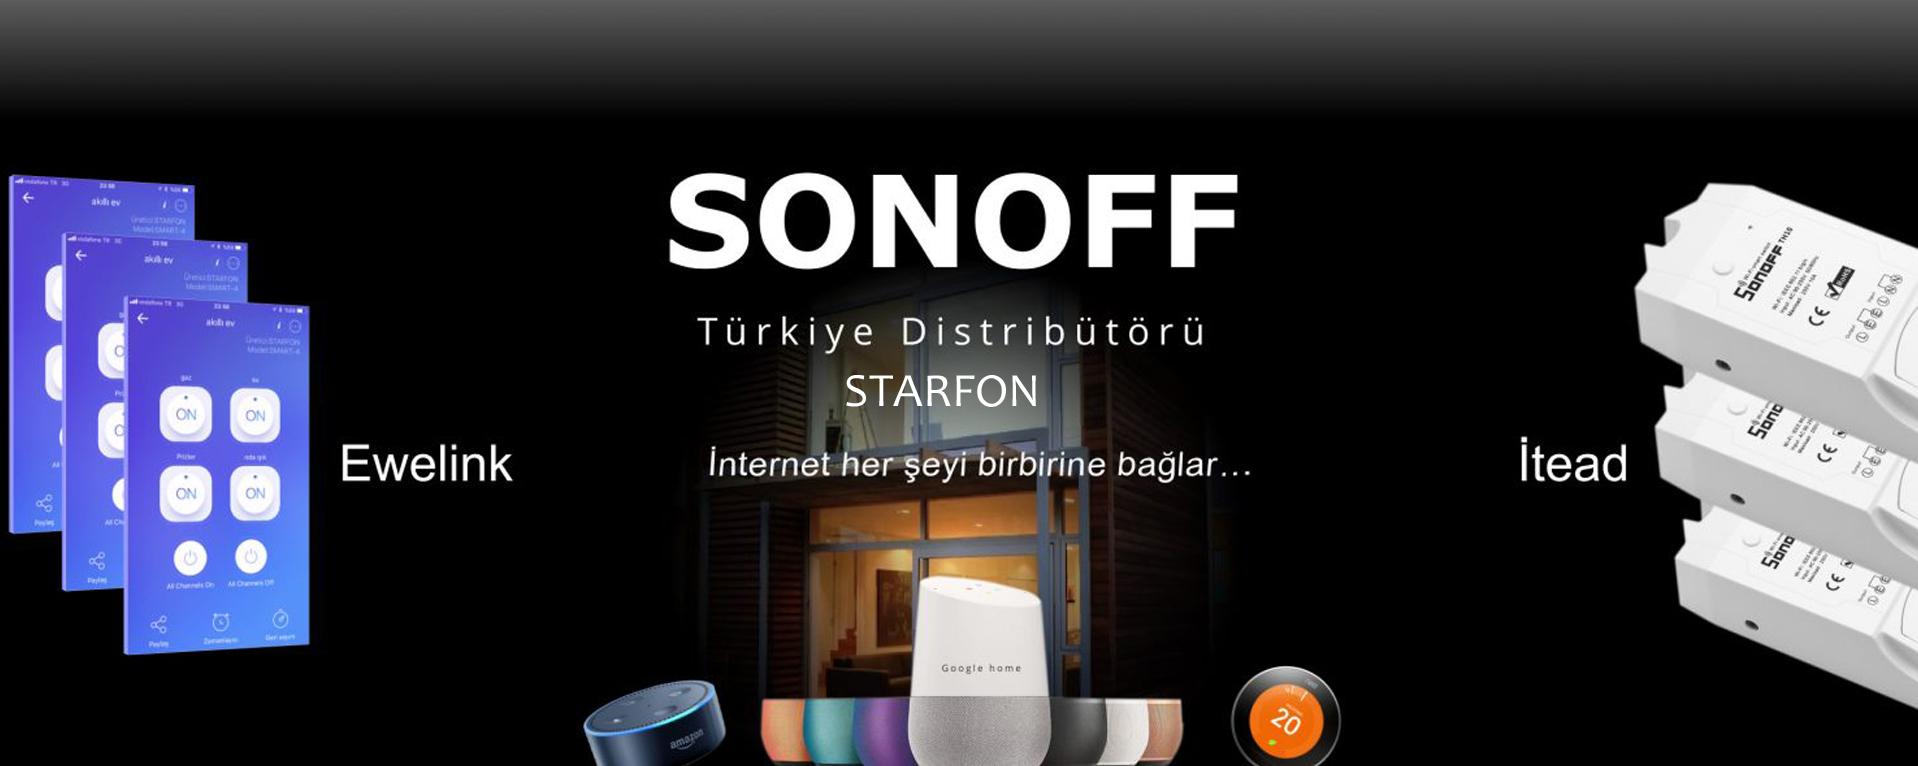 STARFON SONOFF